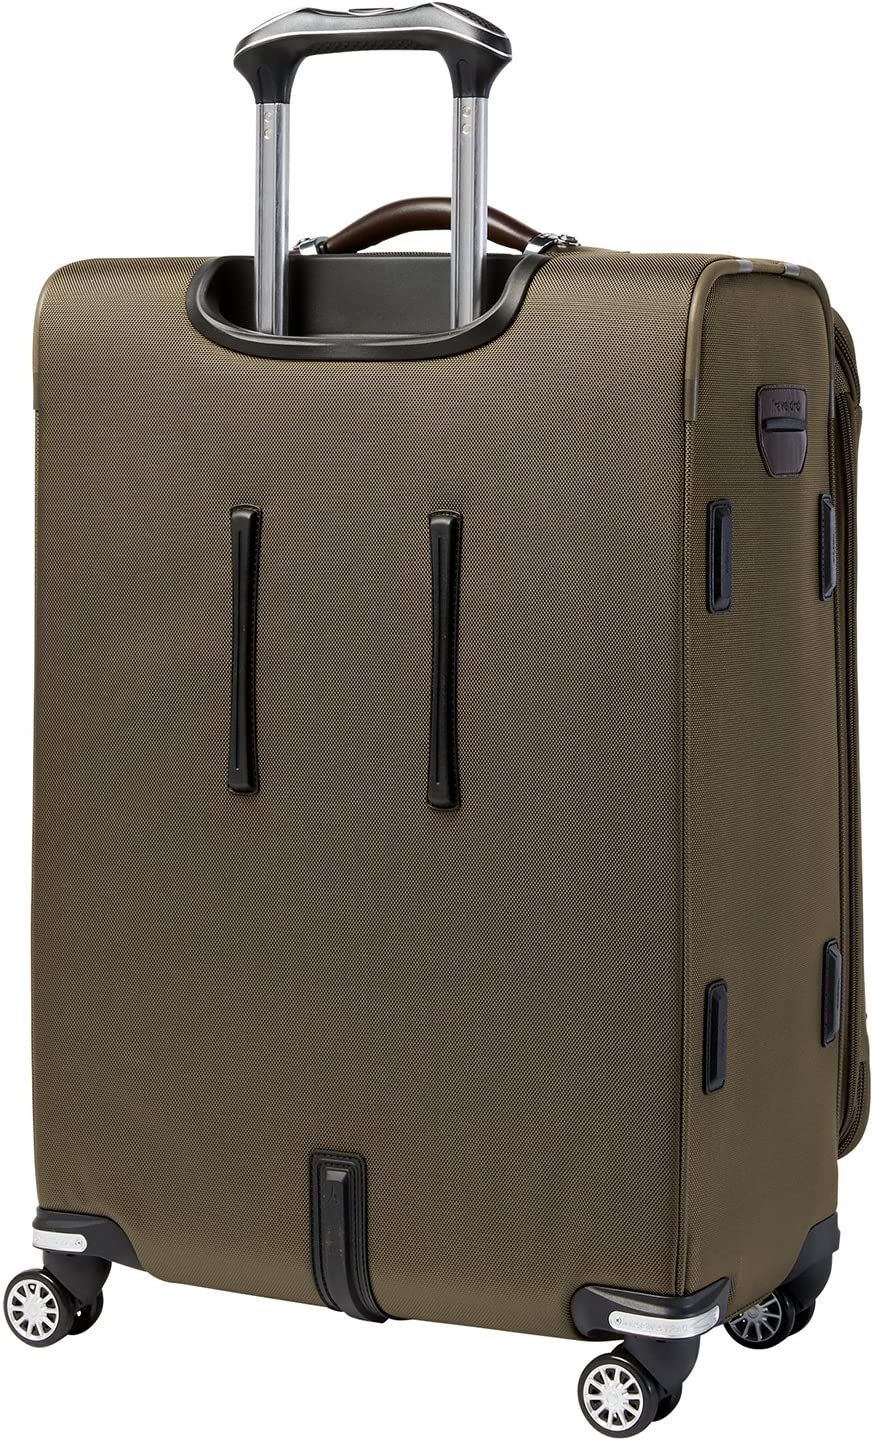 Travelpro Platinum Magna 2-Softside Expandable Spinner Wheel Luggage Black